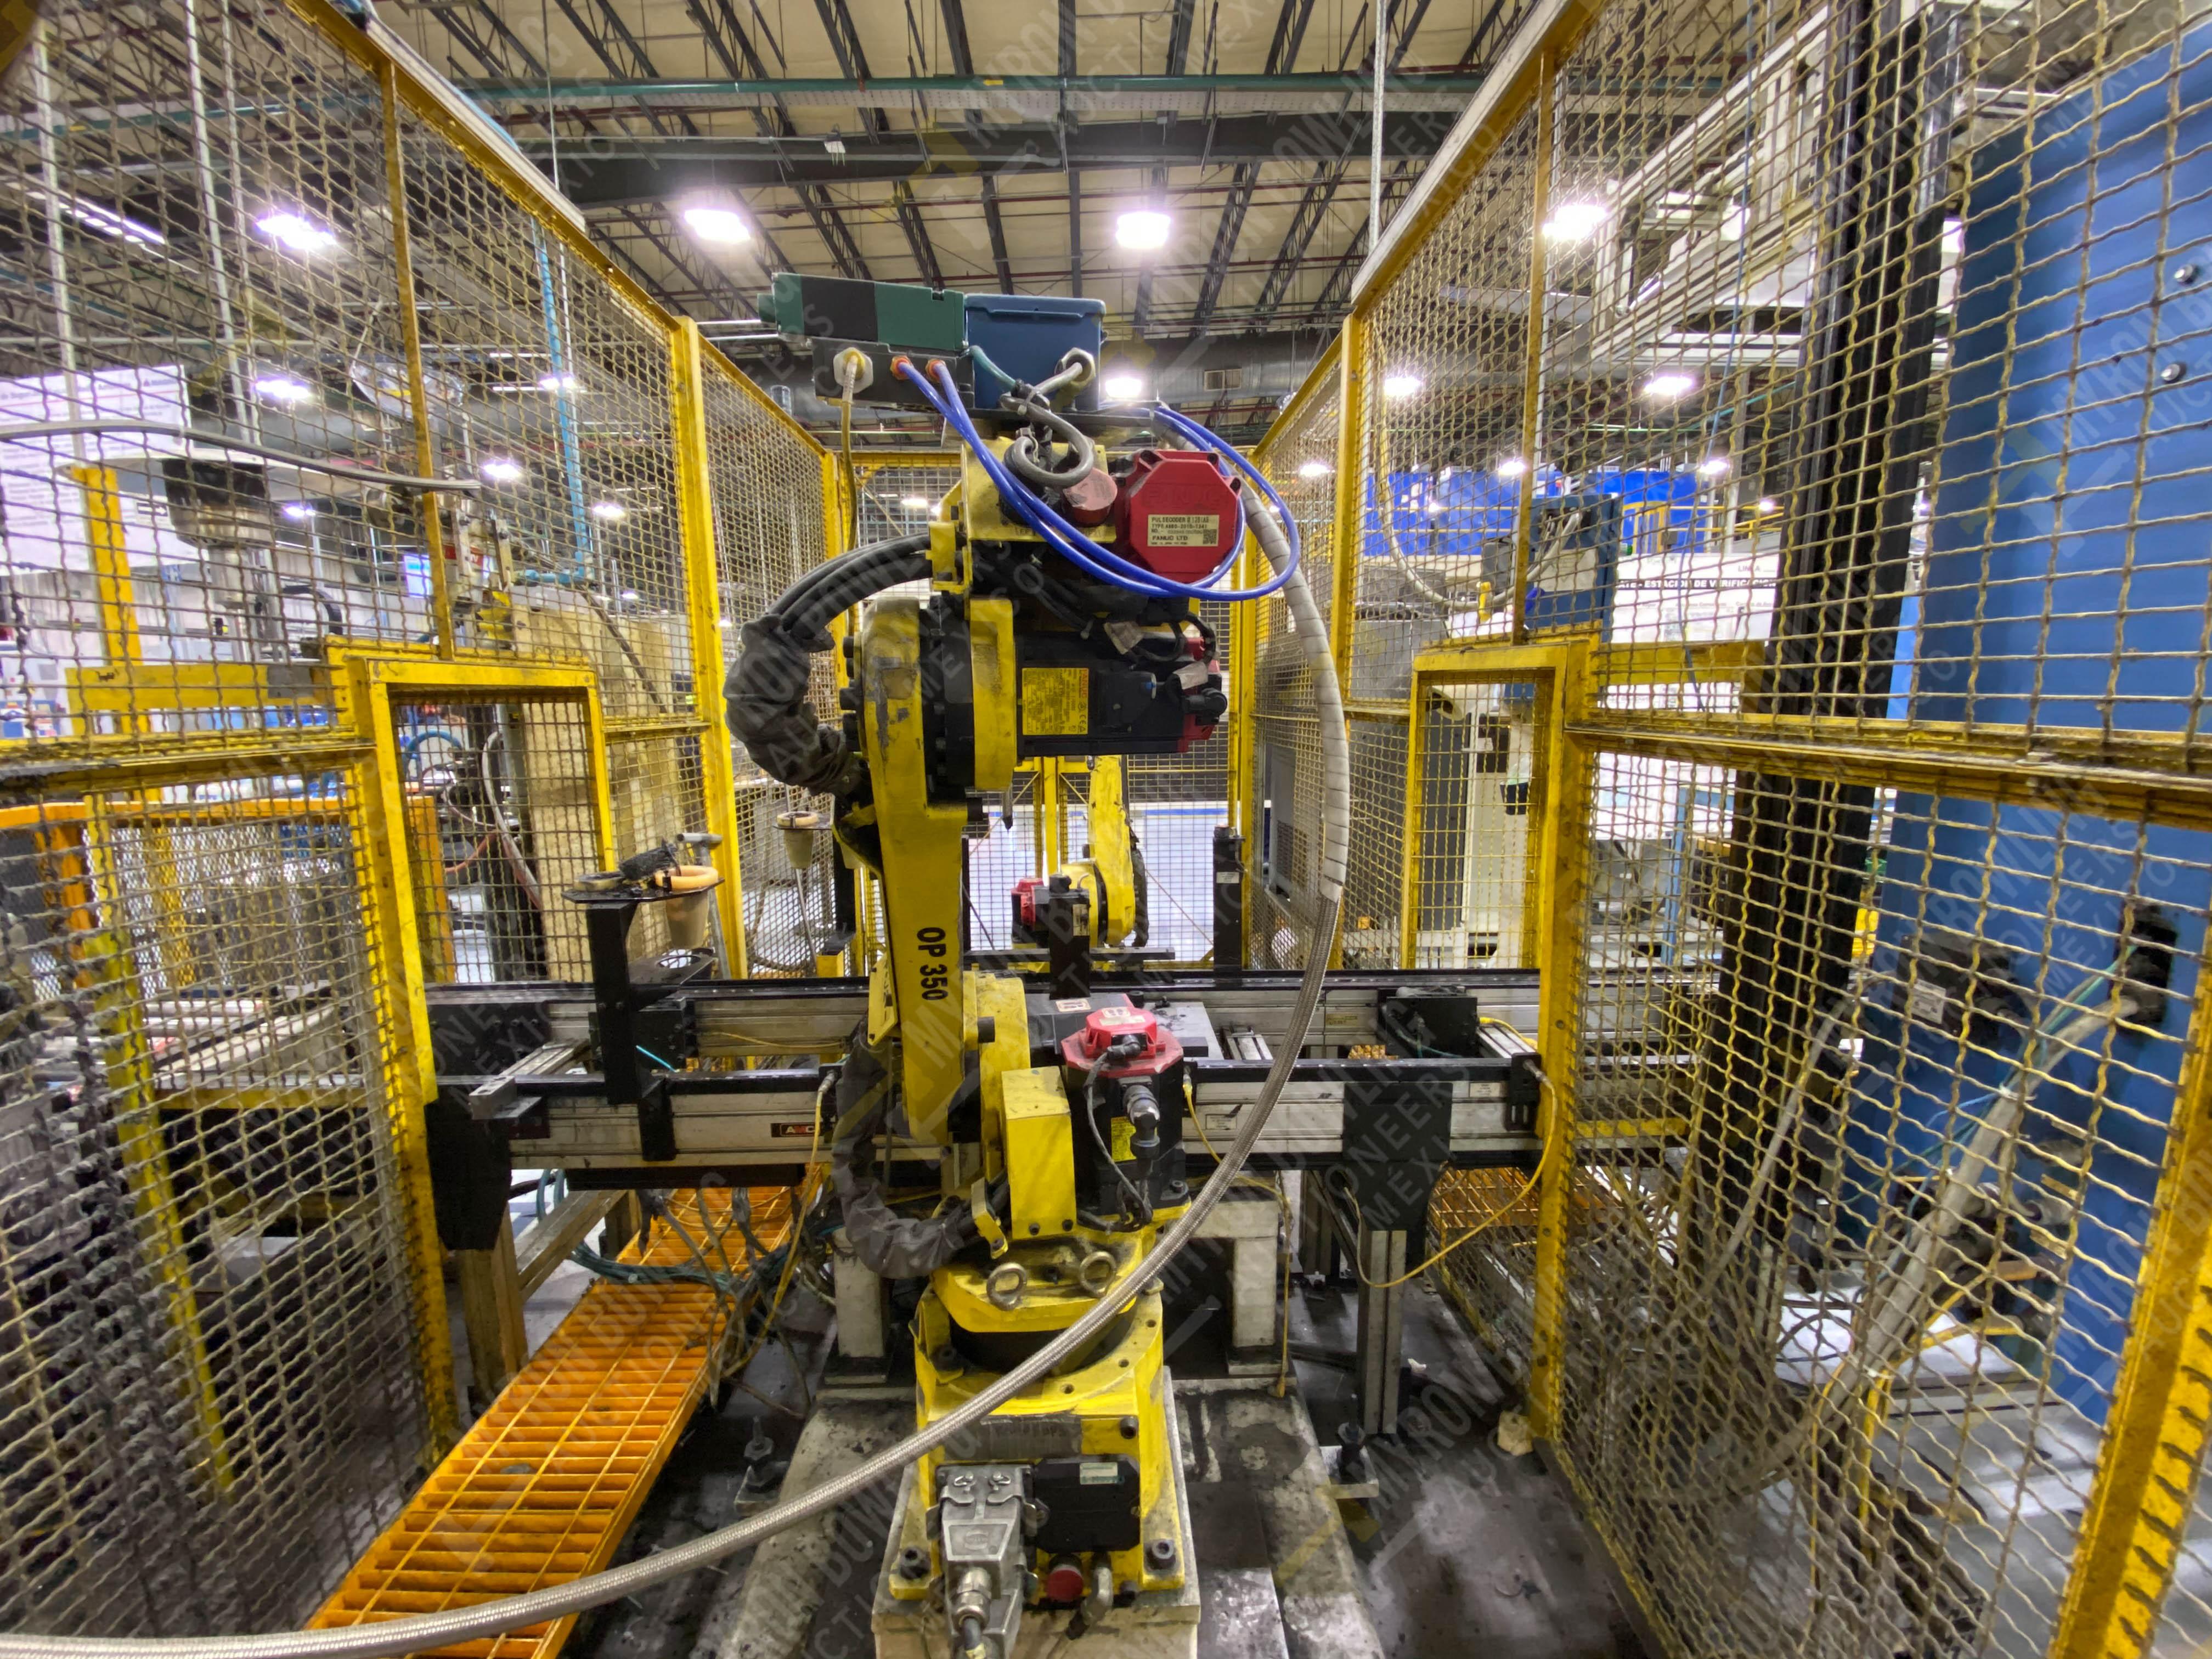 Robot marca Fanuc con capacidad de carga de 15-30 Kg, controlador de robot y teach pendant - Image 4 of 14